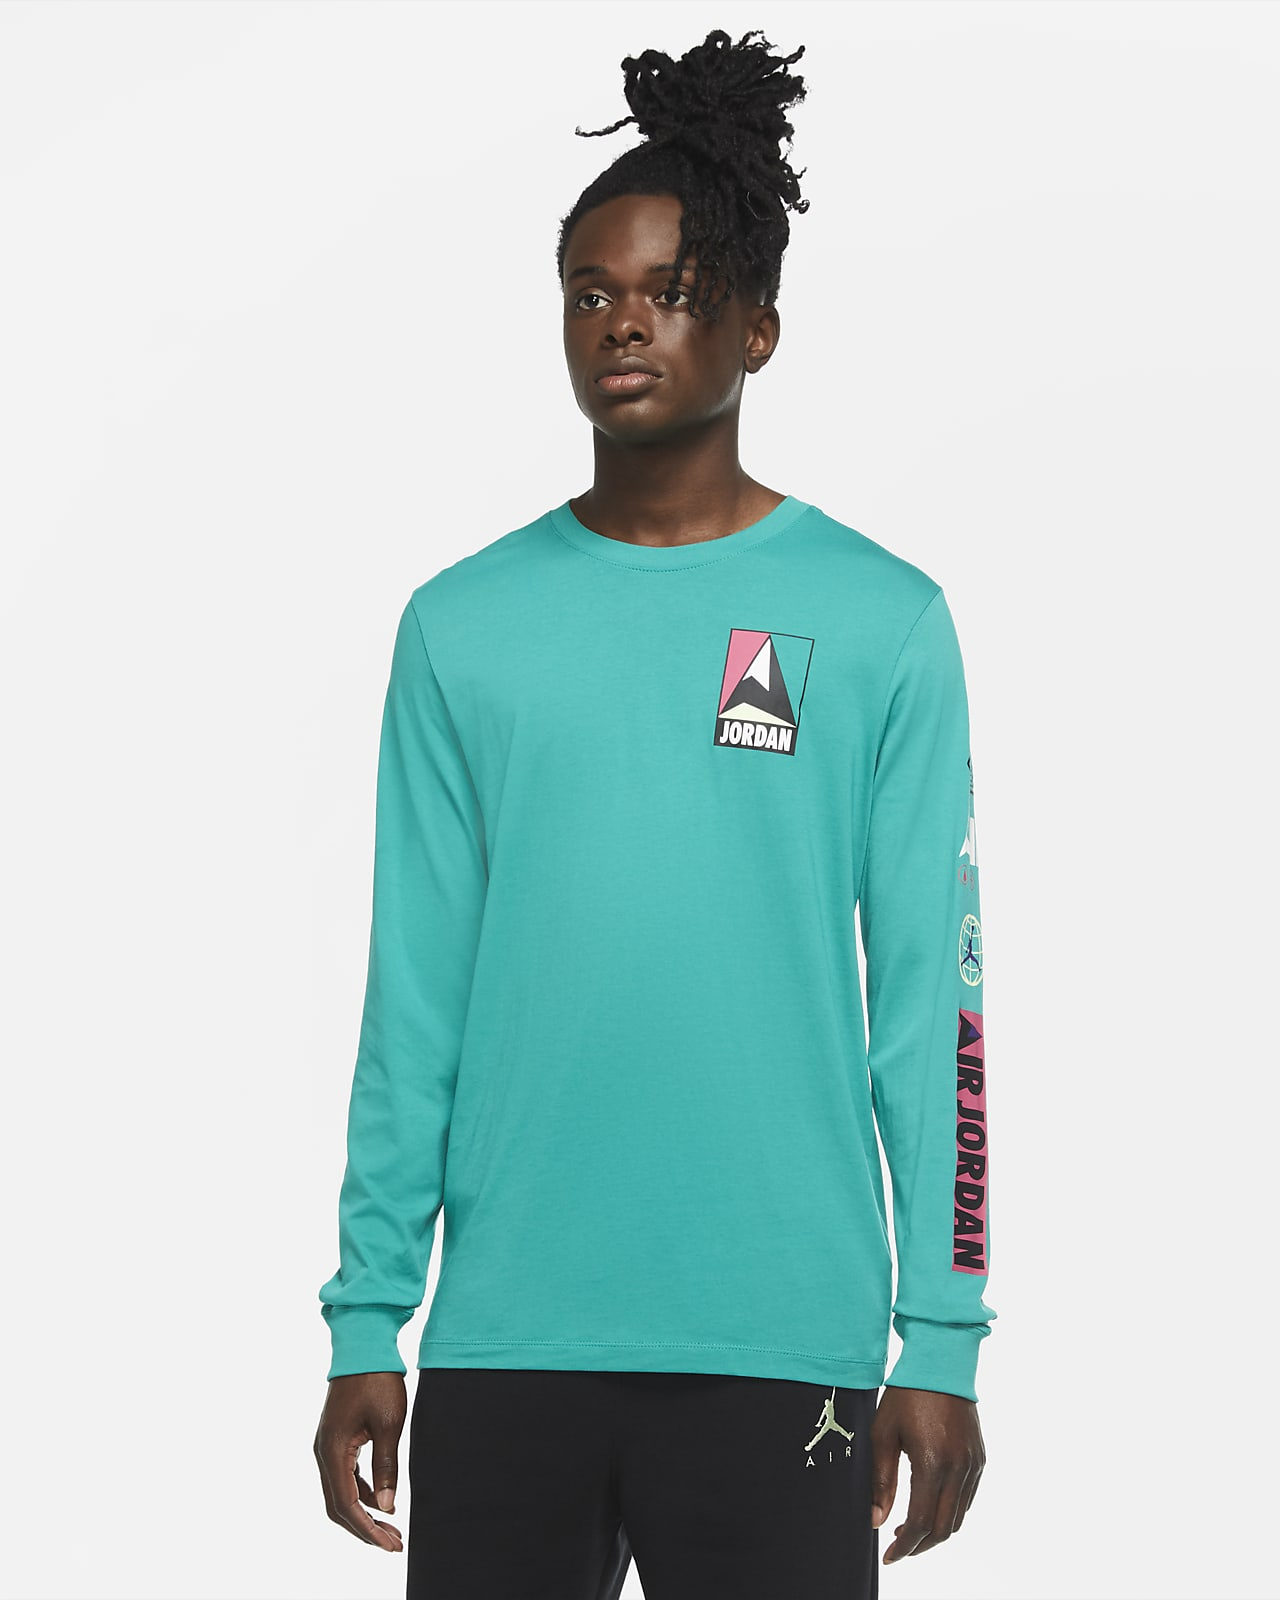 T-shirt a manica lunga Jordan Winter Utility - Uomo